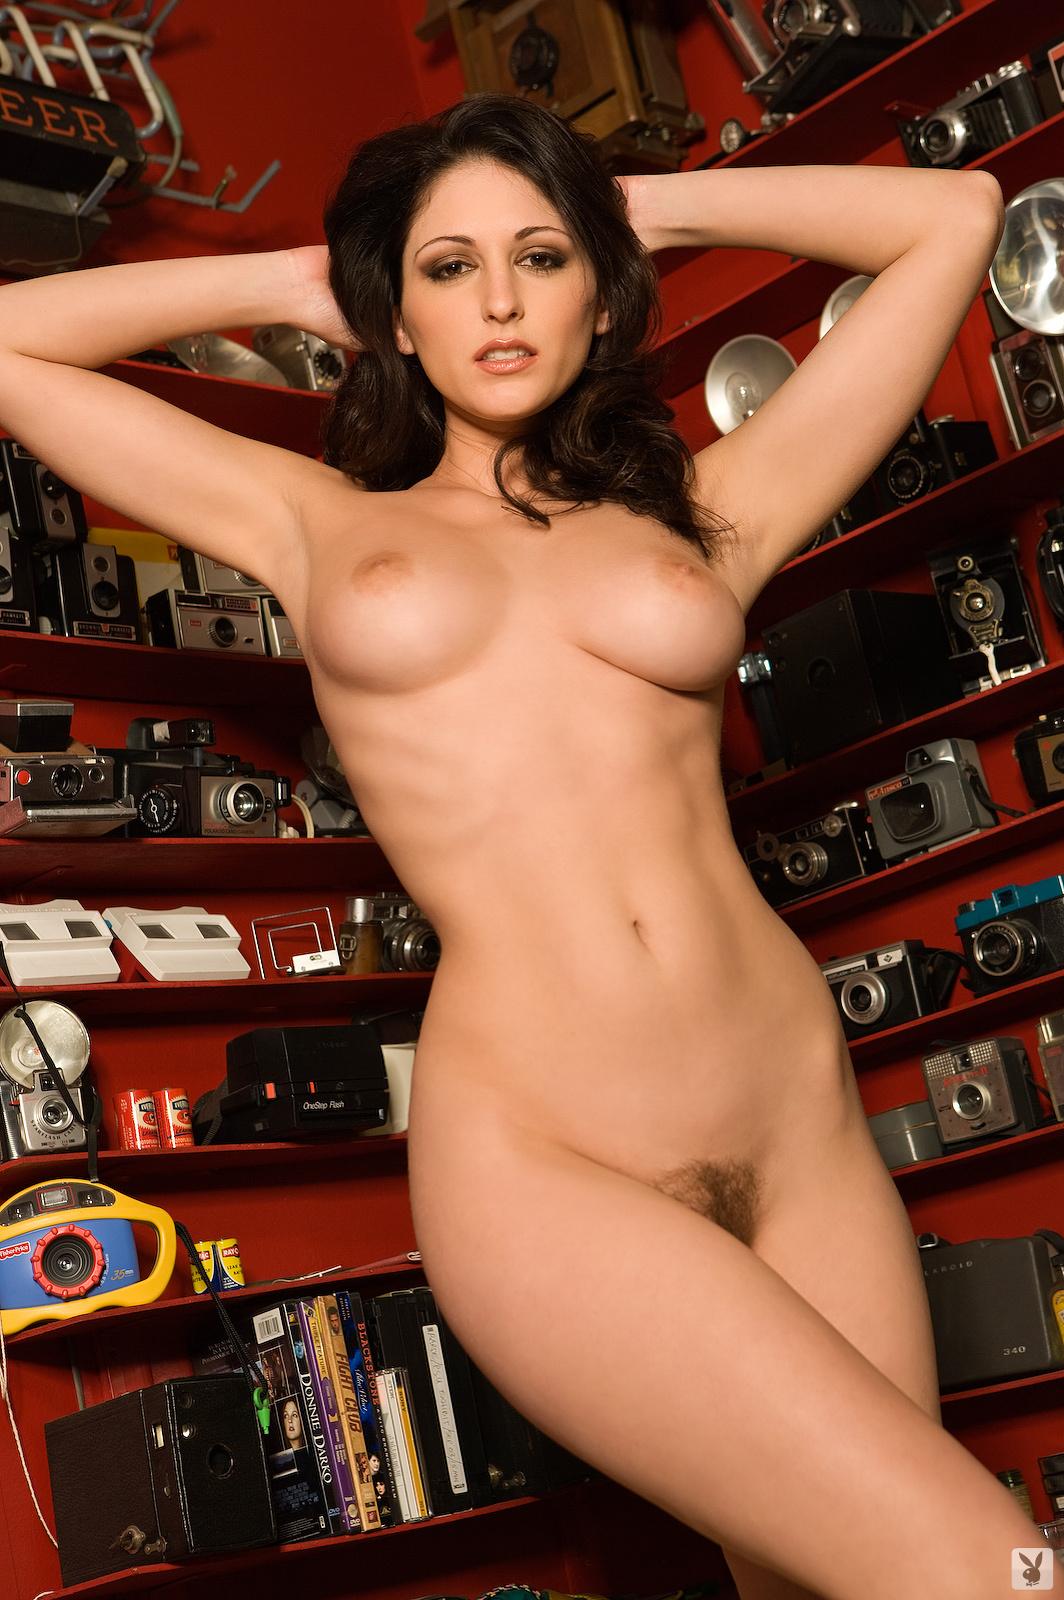 Cyber Girl Xtra December 2008 Carlotta Champagne 03 Playboy Plus (21)